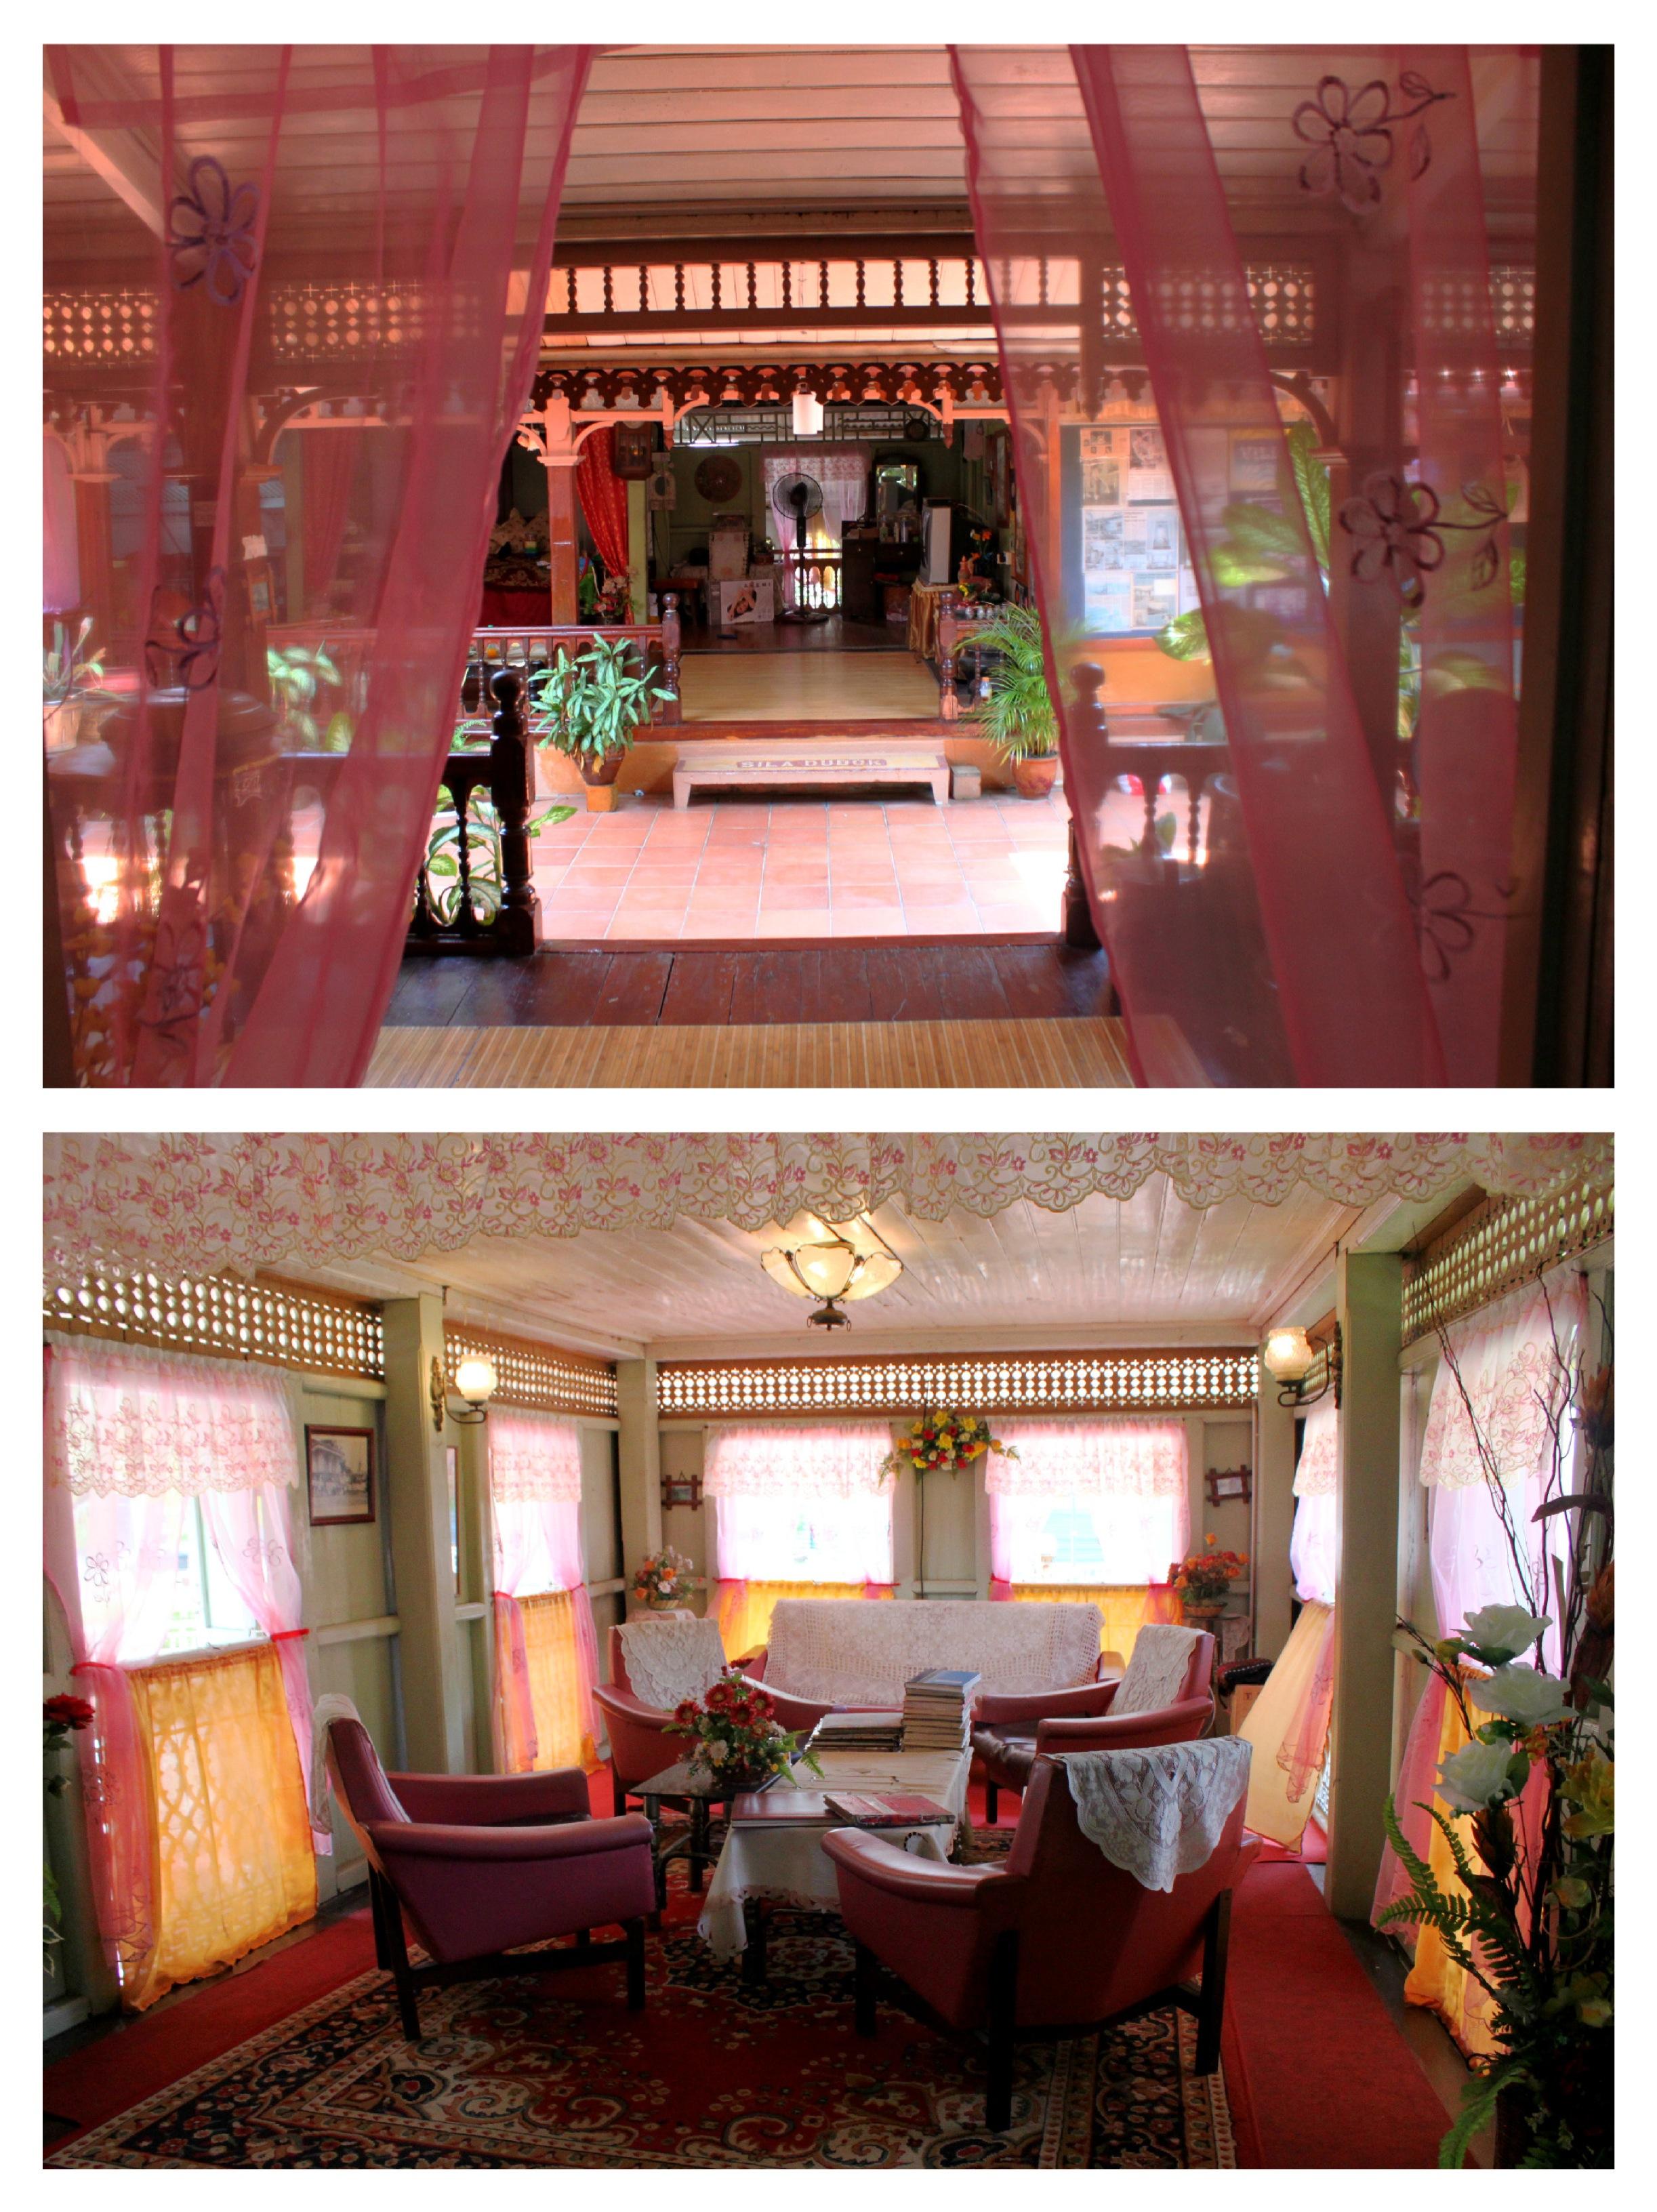 Interno Villa Sentosa, Malacca, Melaka, Malesia